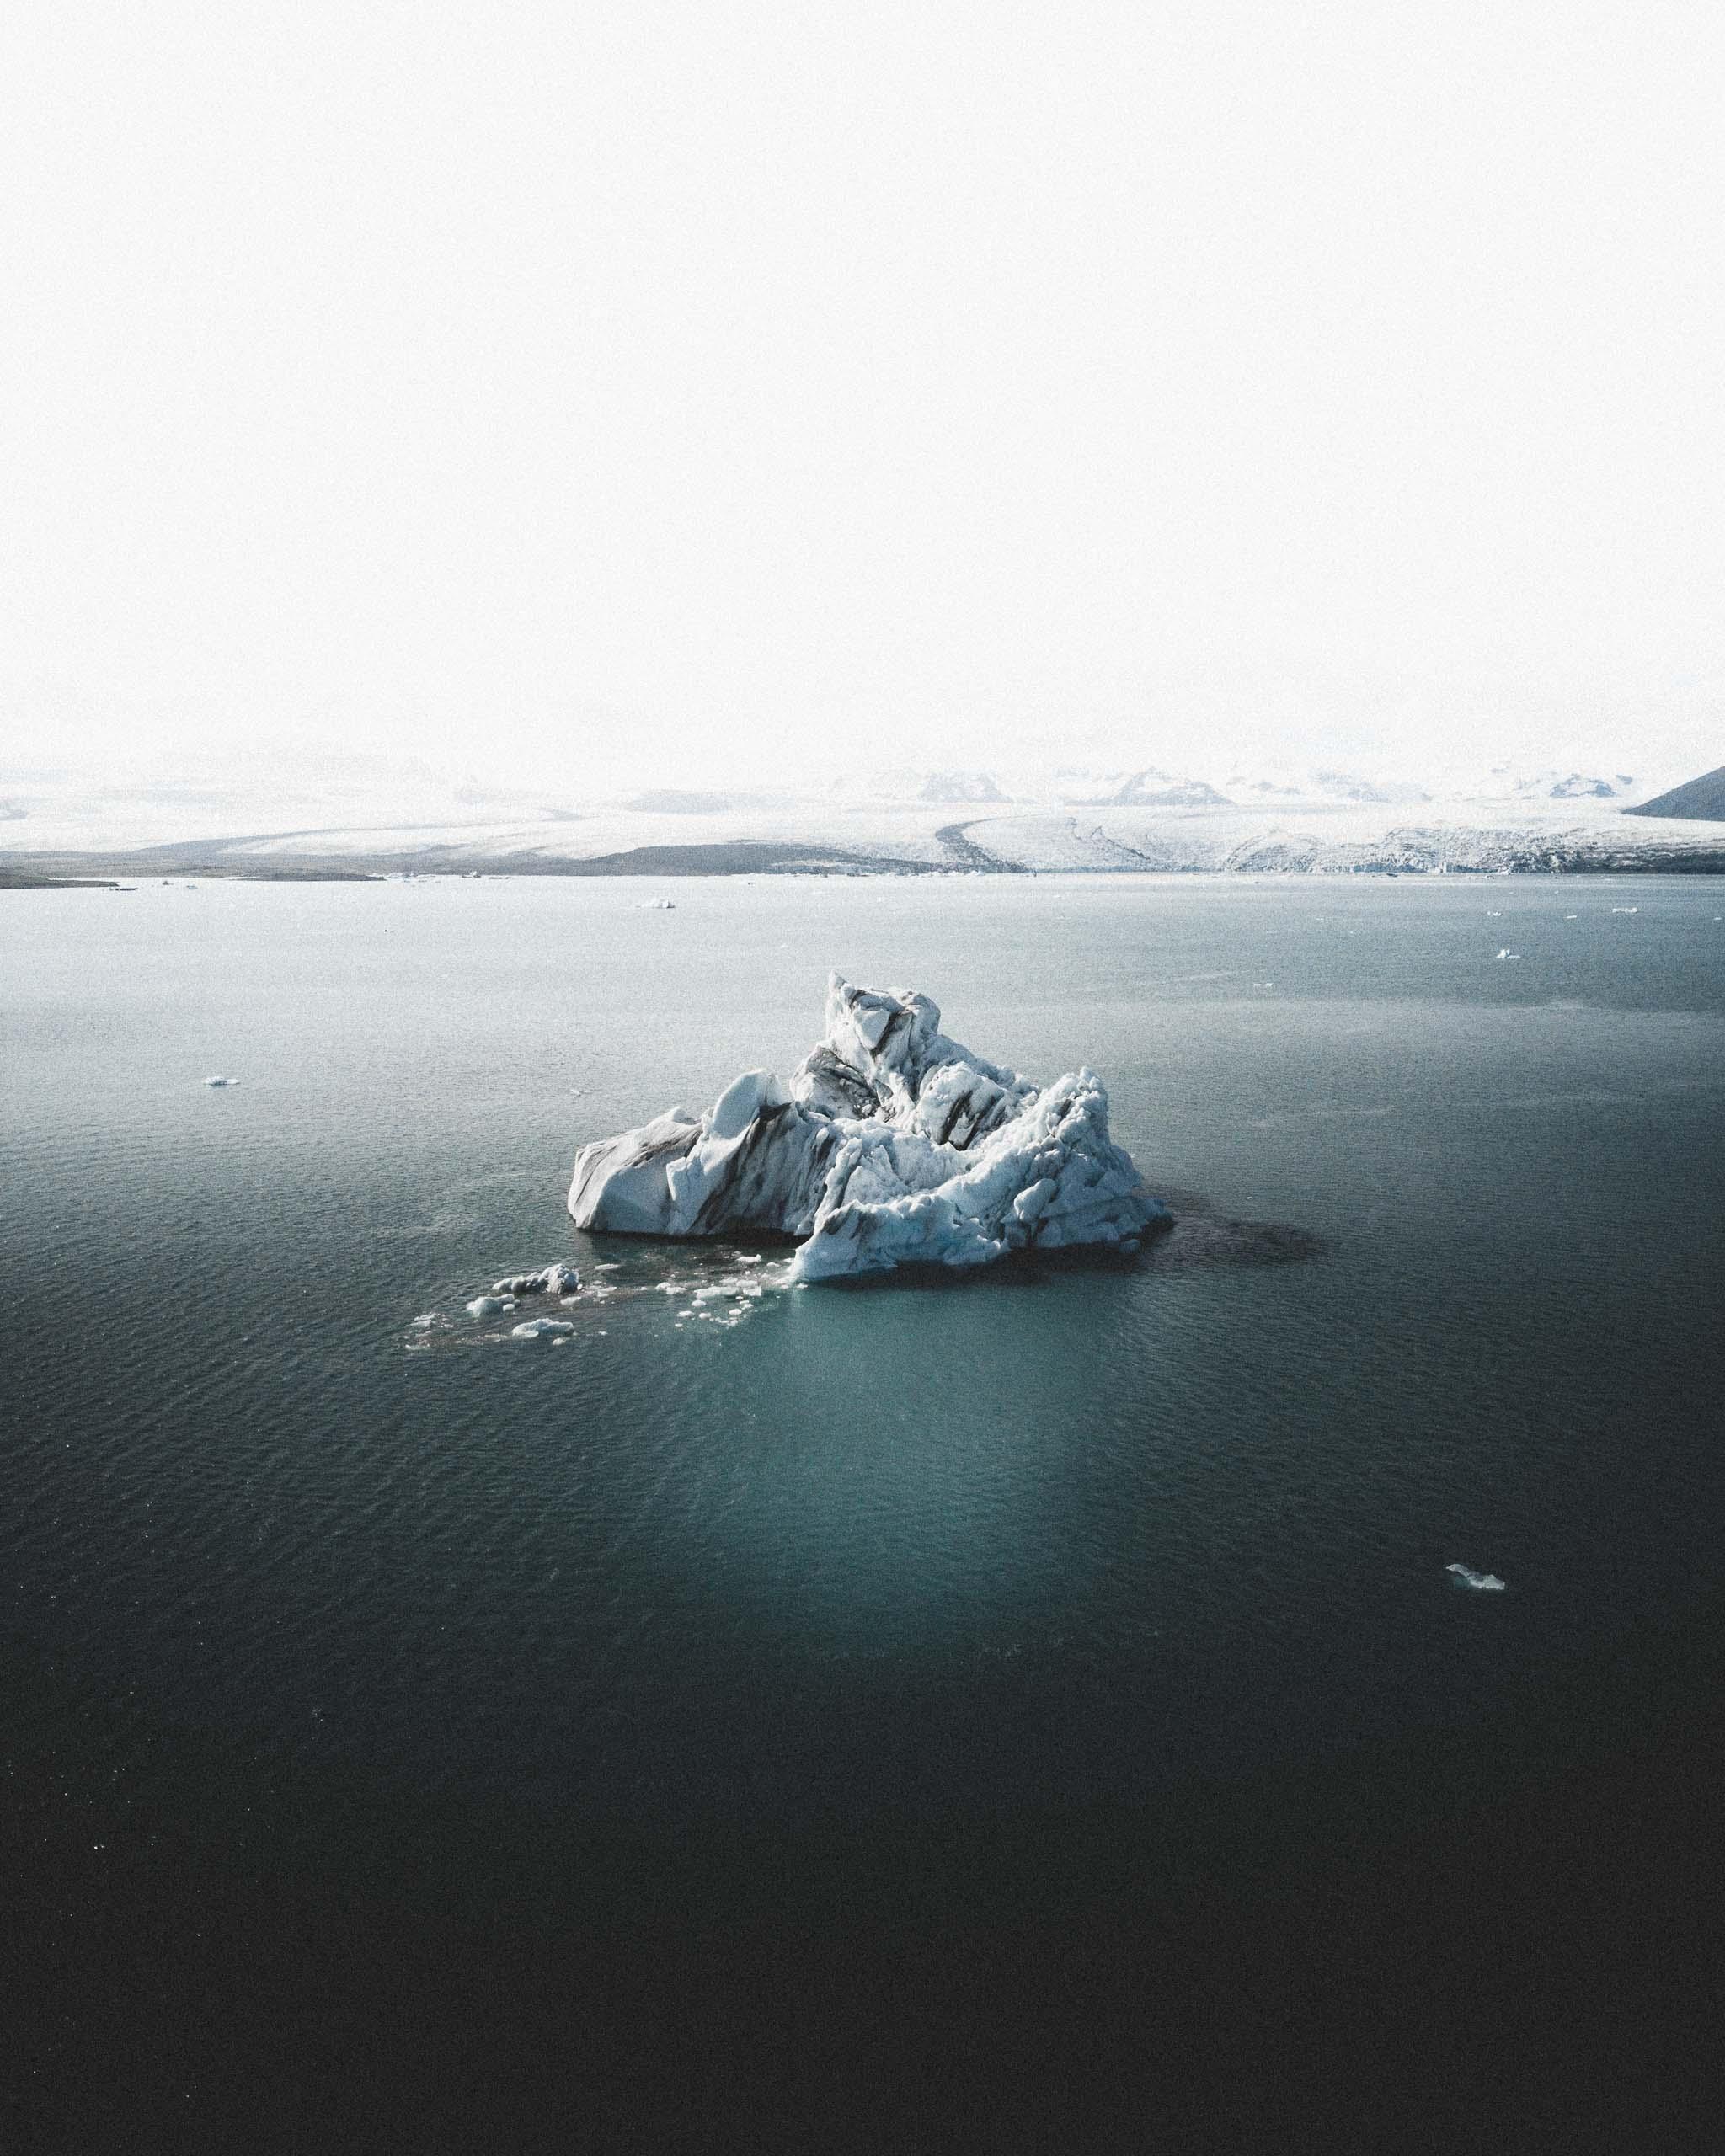 Jökulsárlón Glacier Lagoon | Hidden Iceland | Photo by Norris Niman | Feature